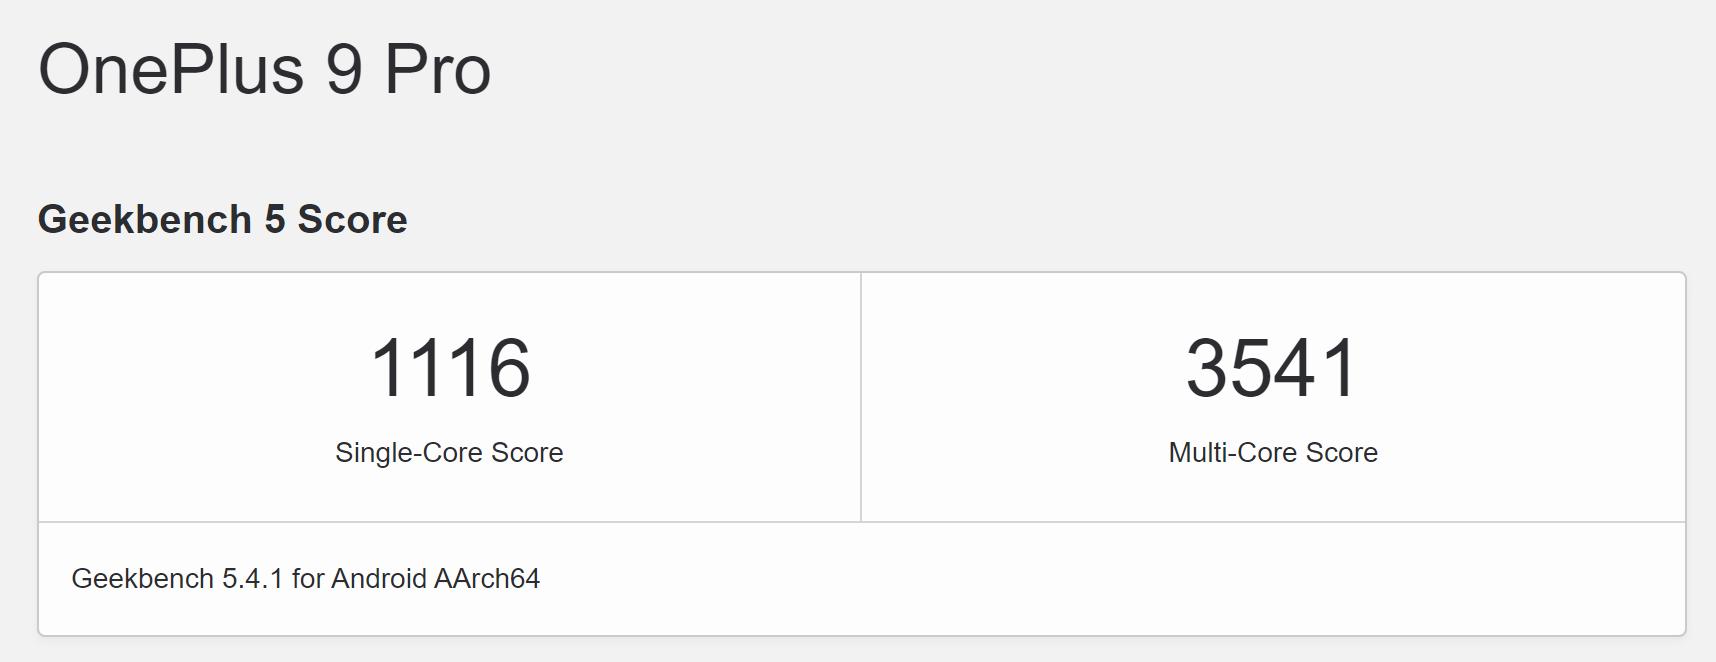 OnePlus 9 Pro Geekbench 5